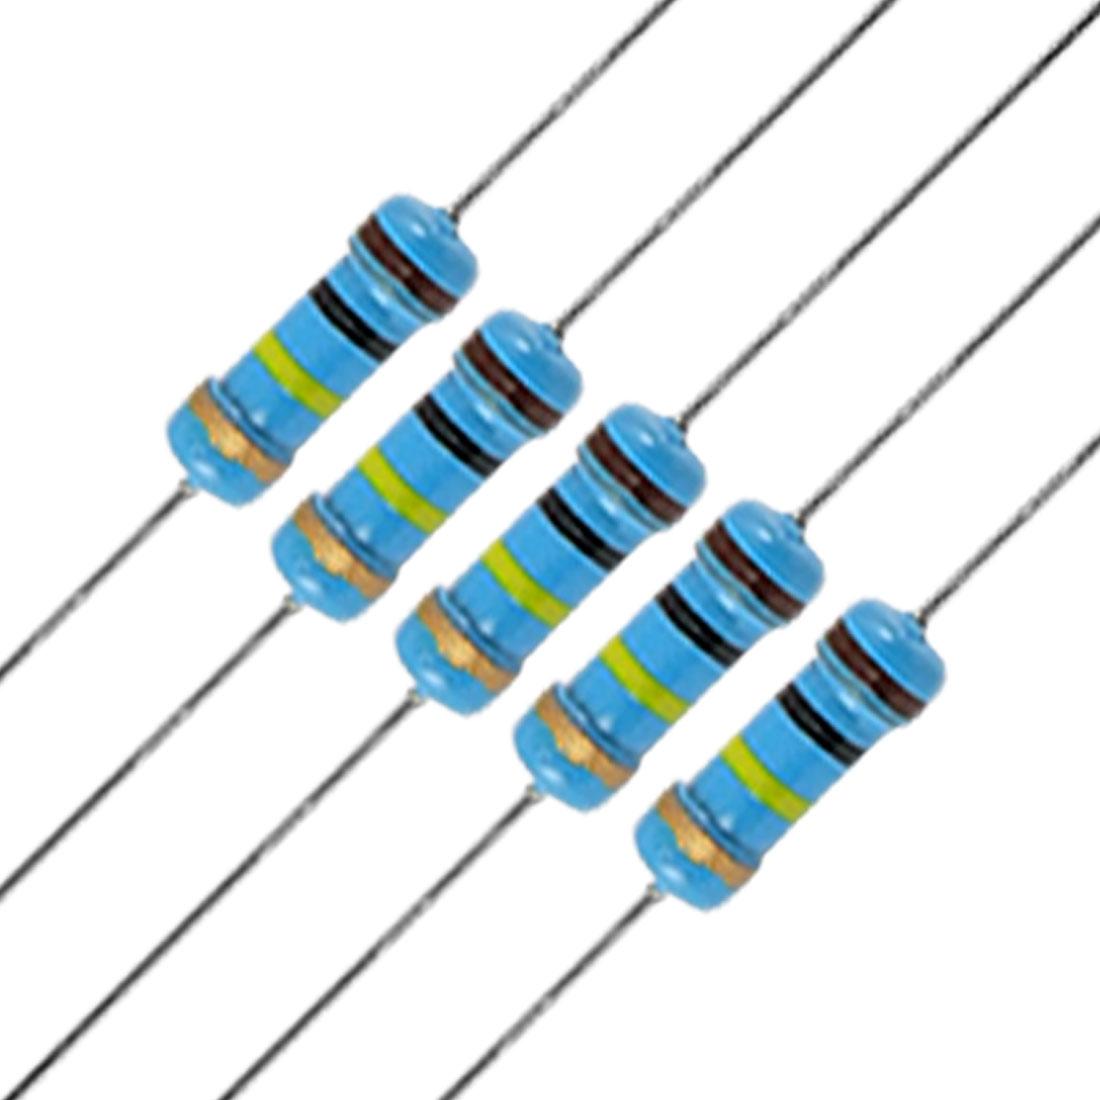 20 x 1/2W Watt 100K ohm 100KR Carbon Film Resistor 0.5W